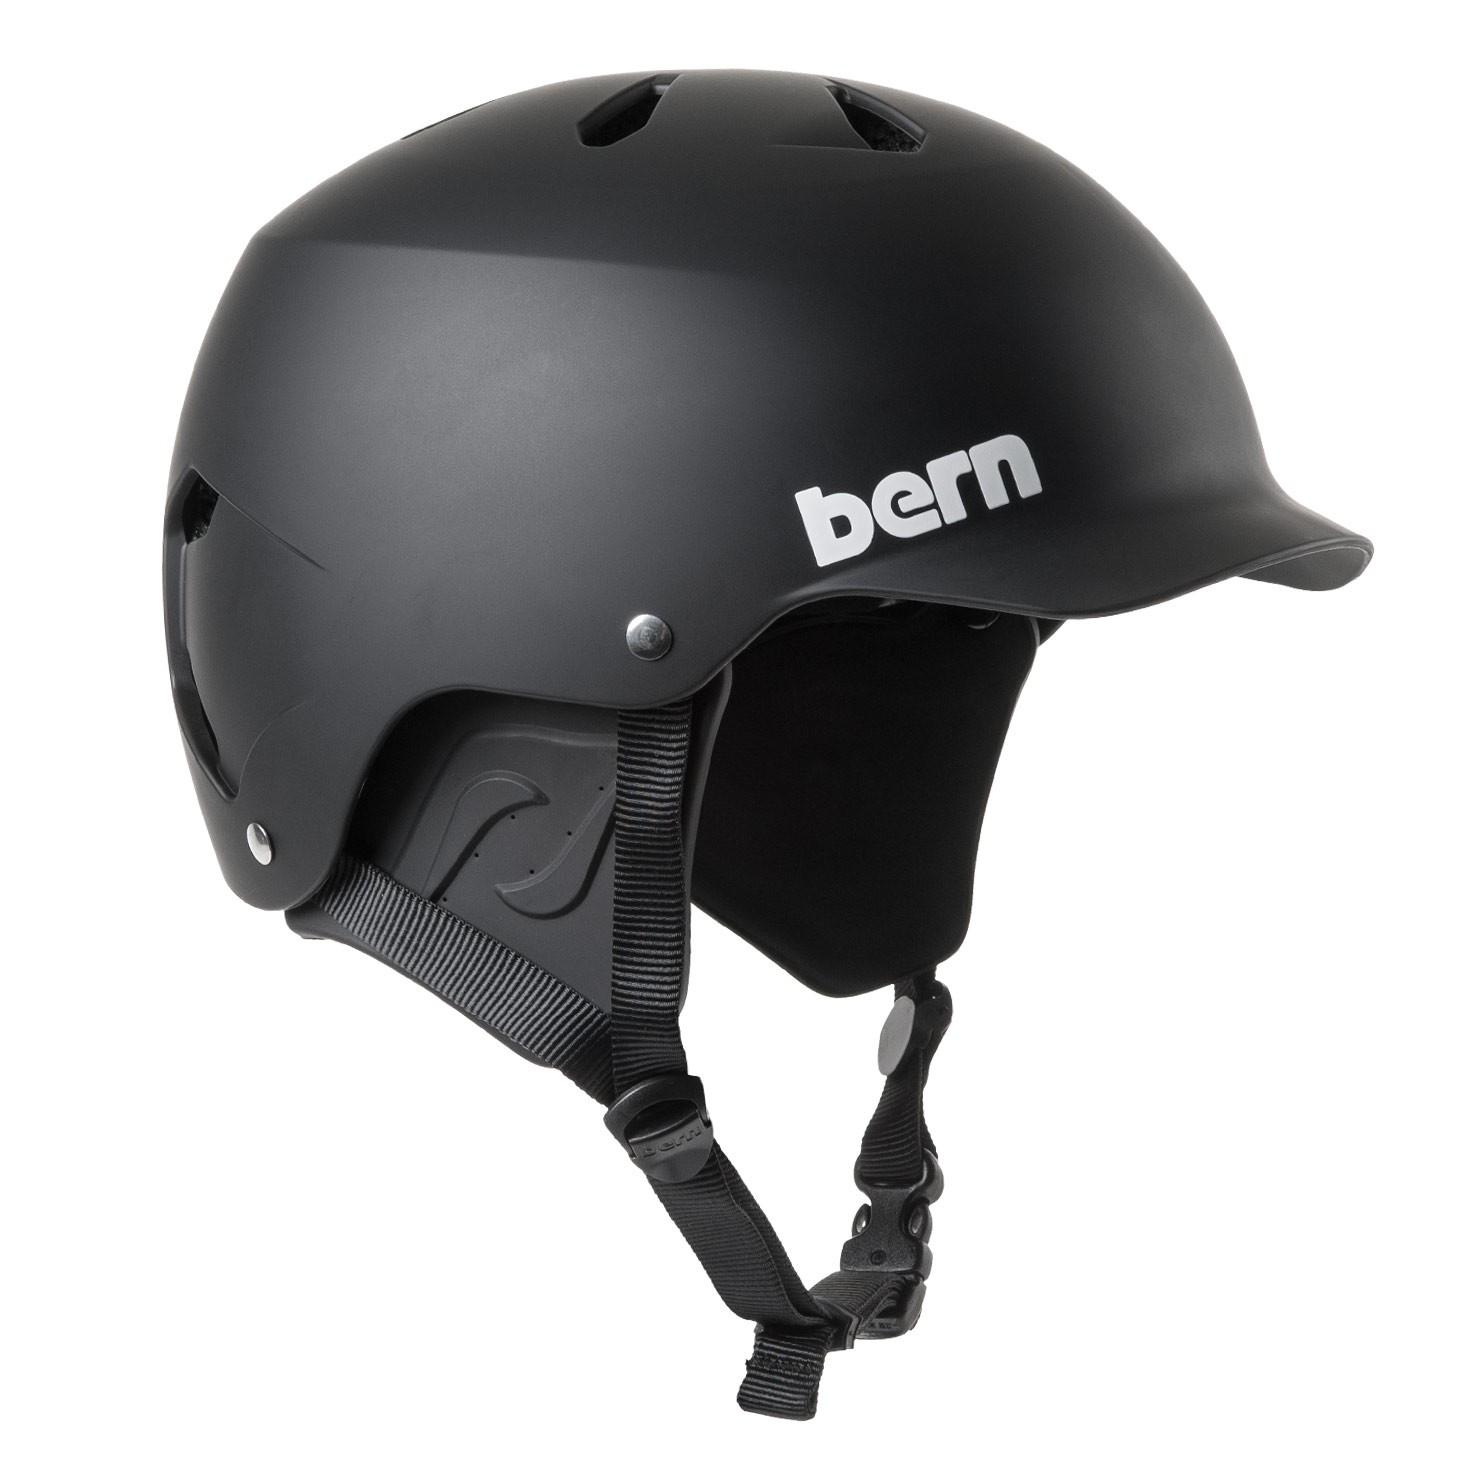 Bern Watts H2O matte black